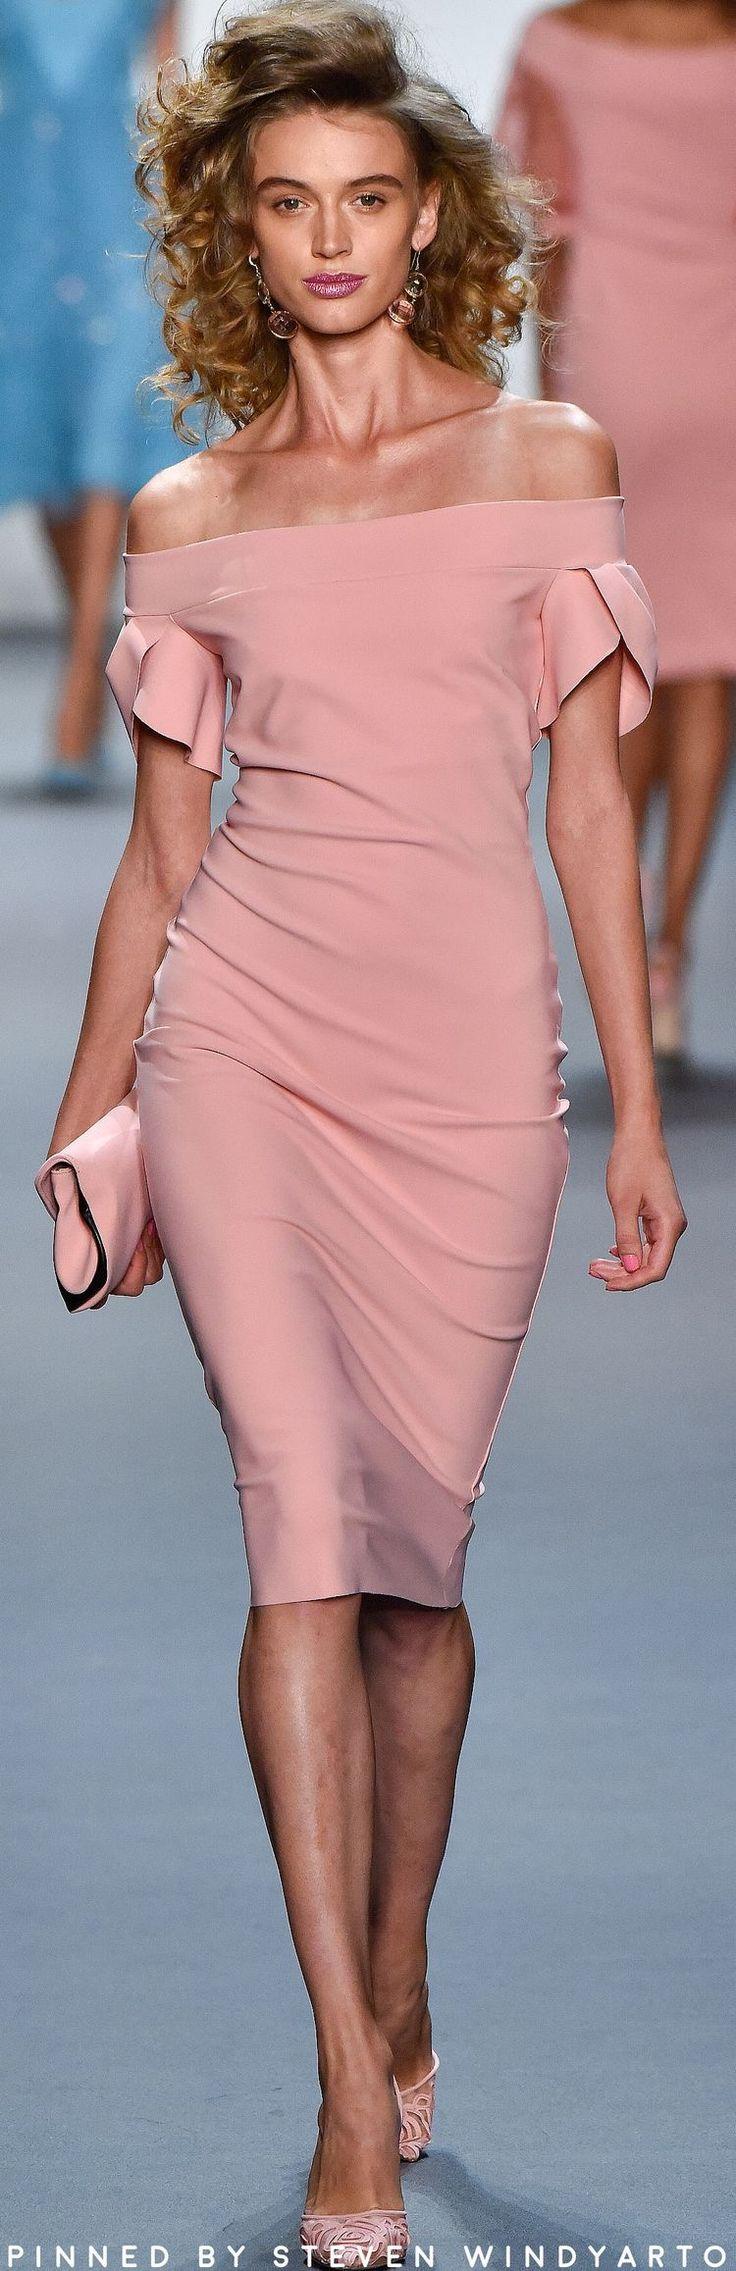 Mejores 58 imágenes de Dresses en Pinterest | Moda femenina, Moda ...